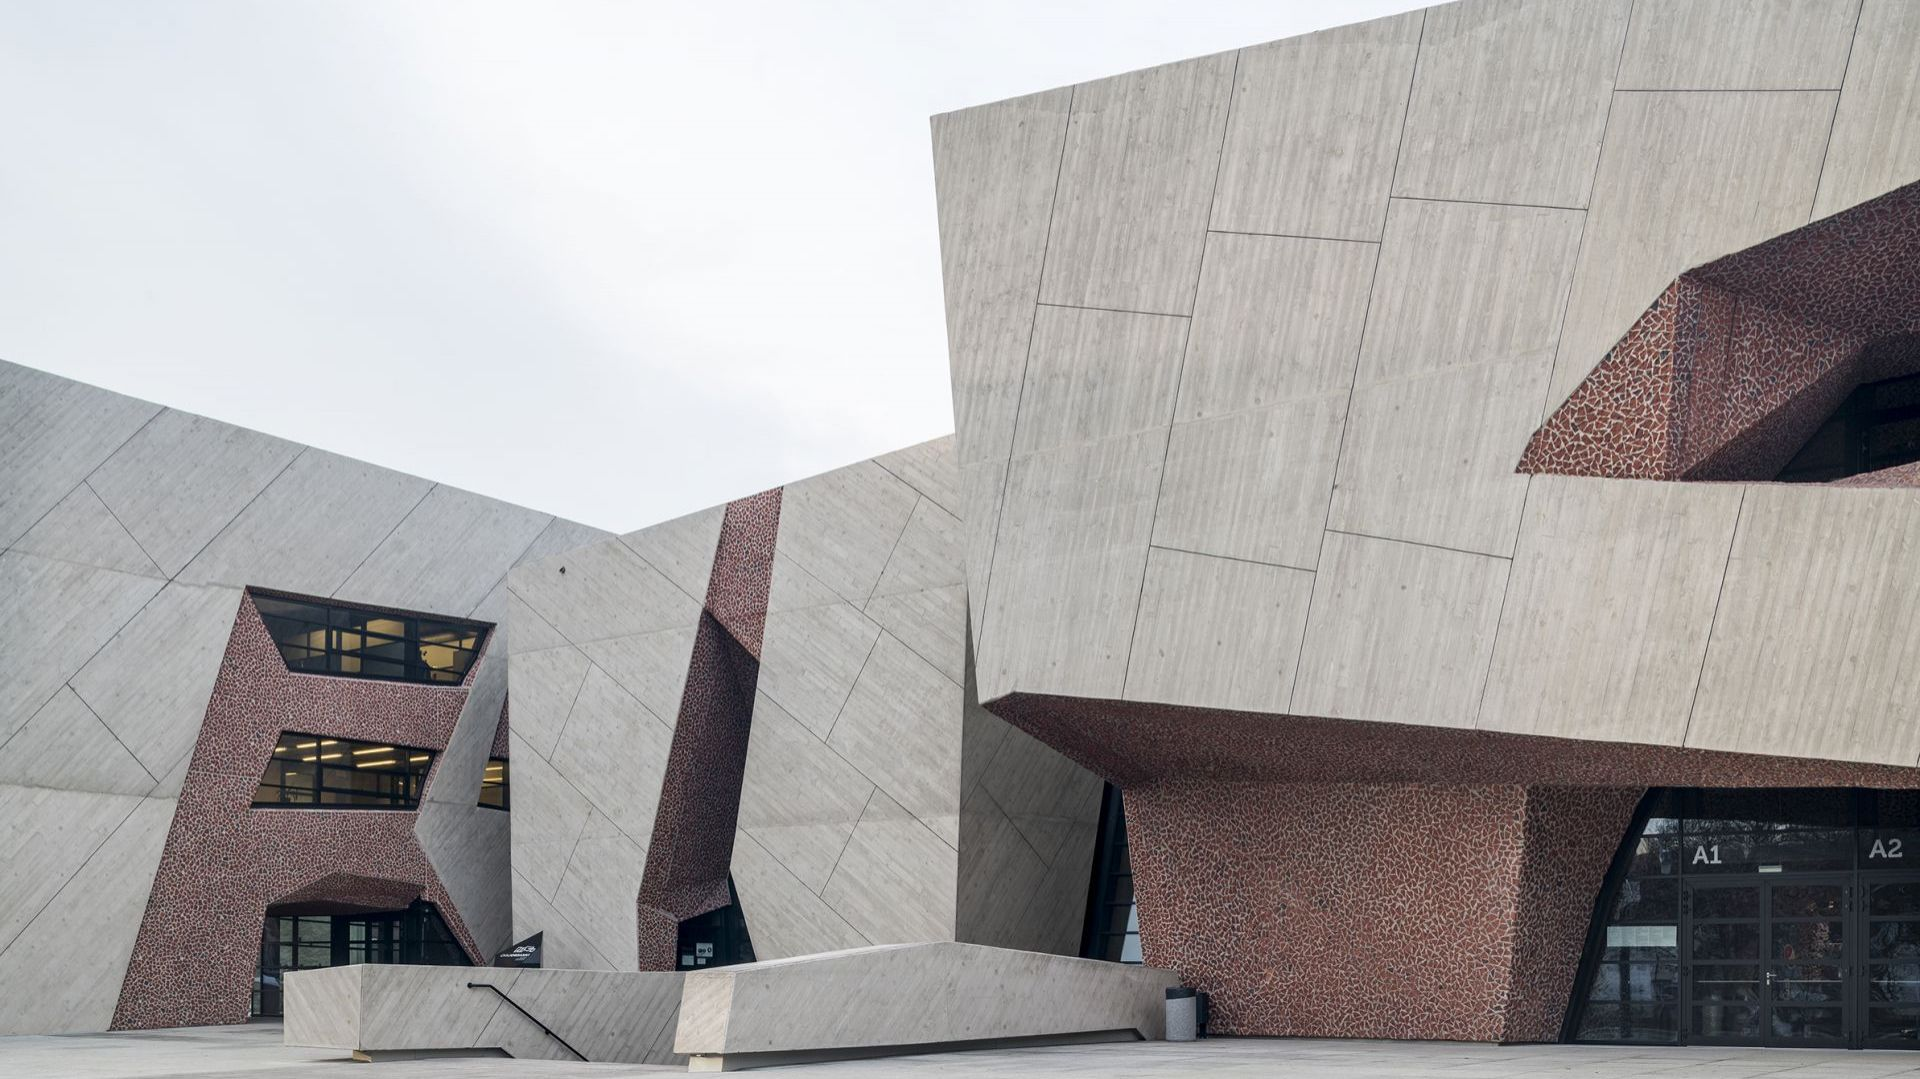 Centrum Kulturalno-Kongresowym Jordanki w Toruniu_Cultural and Congress Centre Jordanki in Toruń_Exterior; Jakub Certowicz.jpg